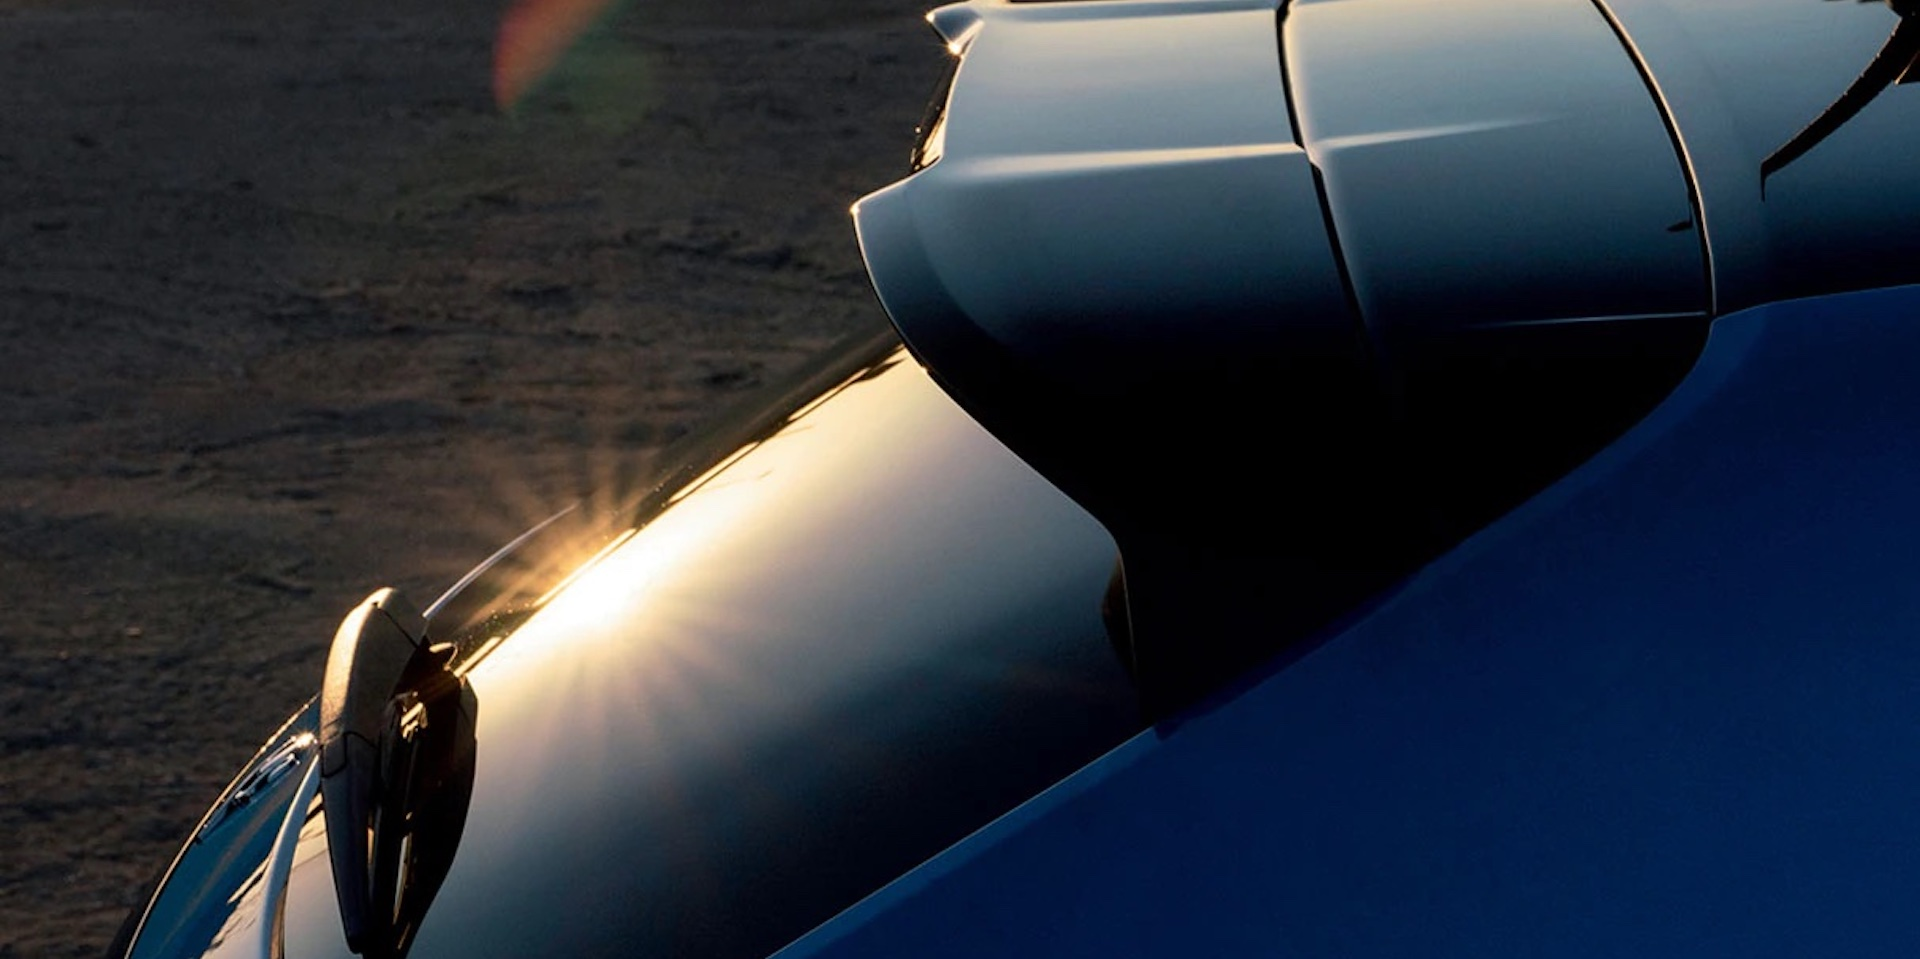 Peugeot 208 elétrico no Barreiro